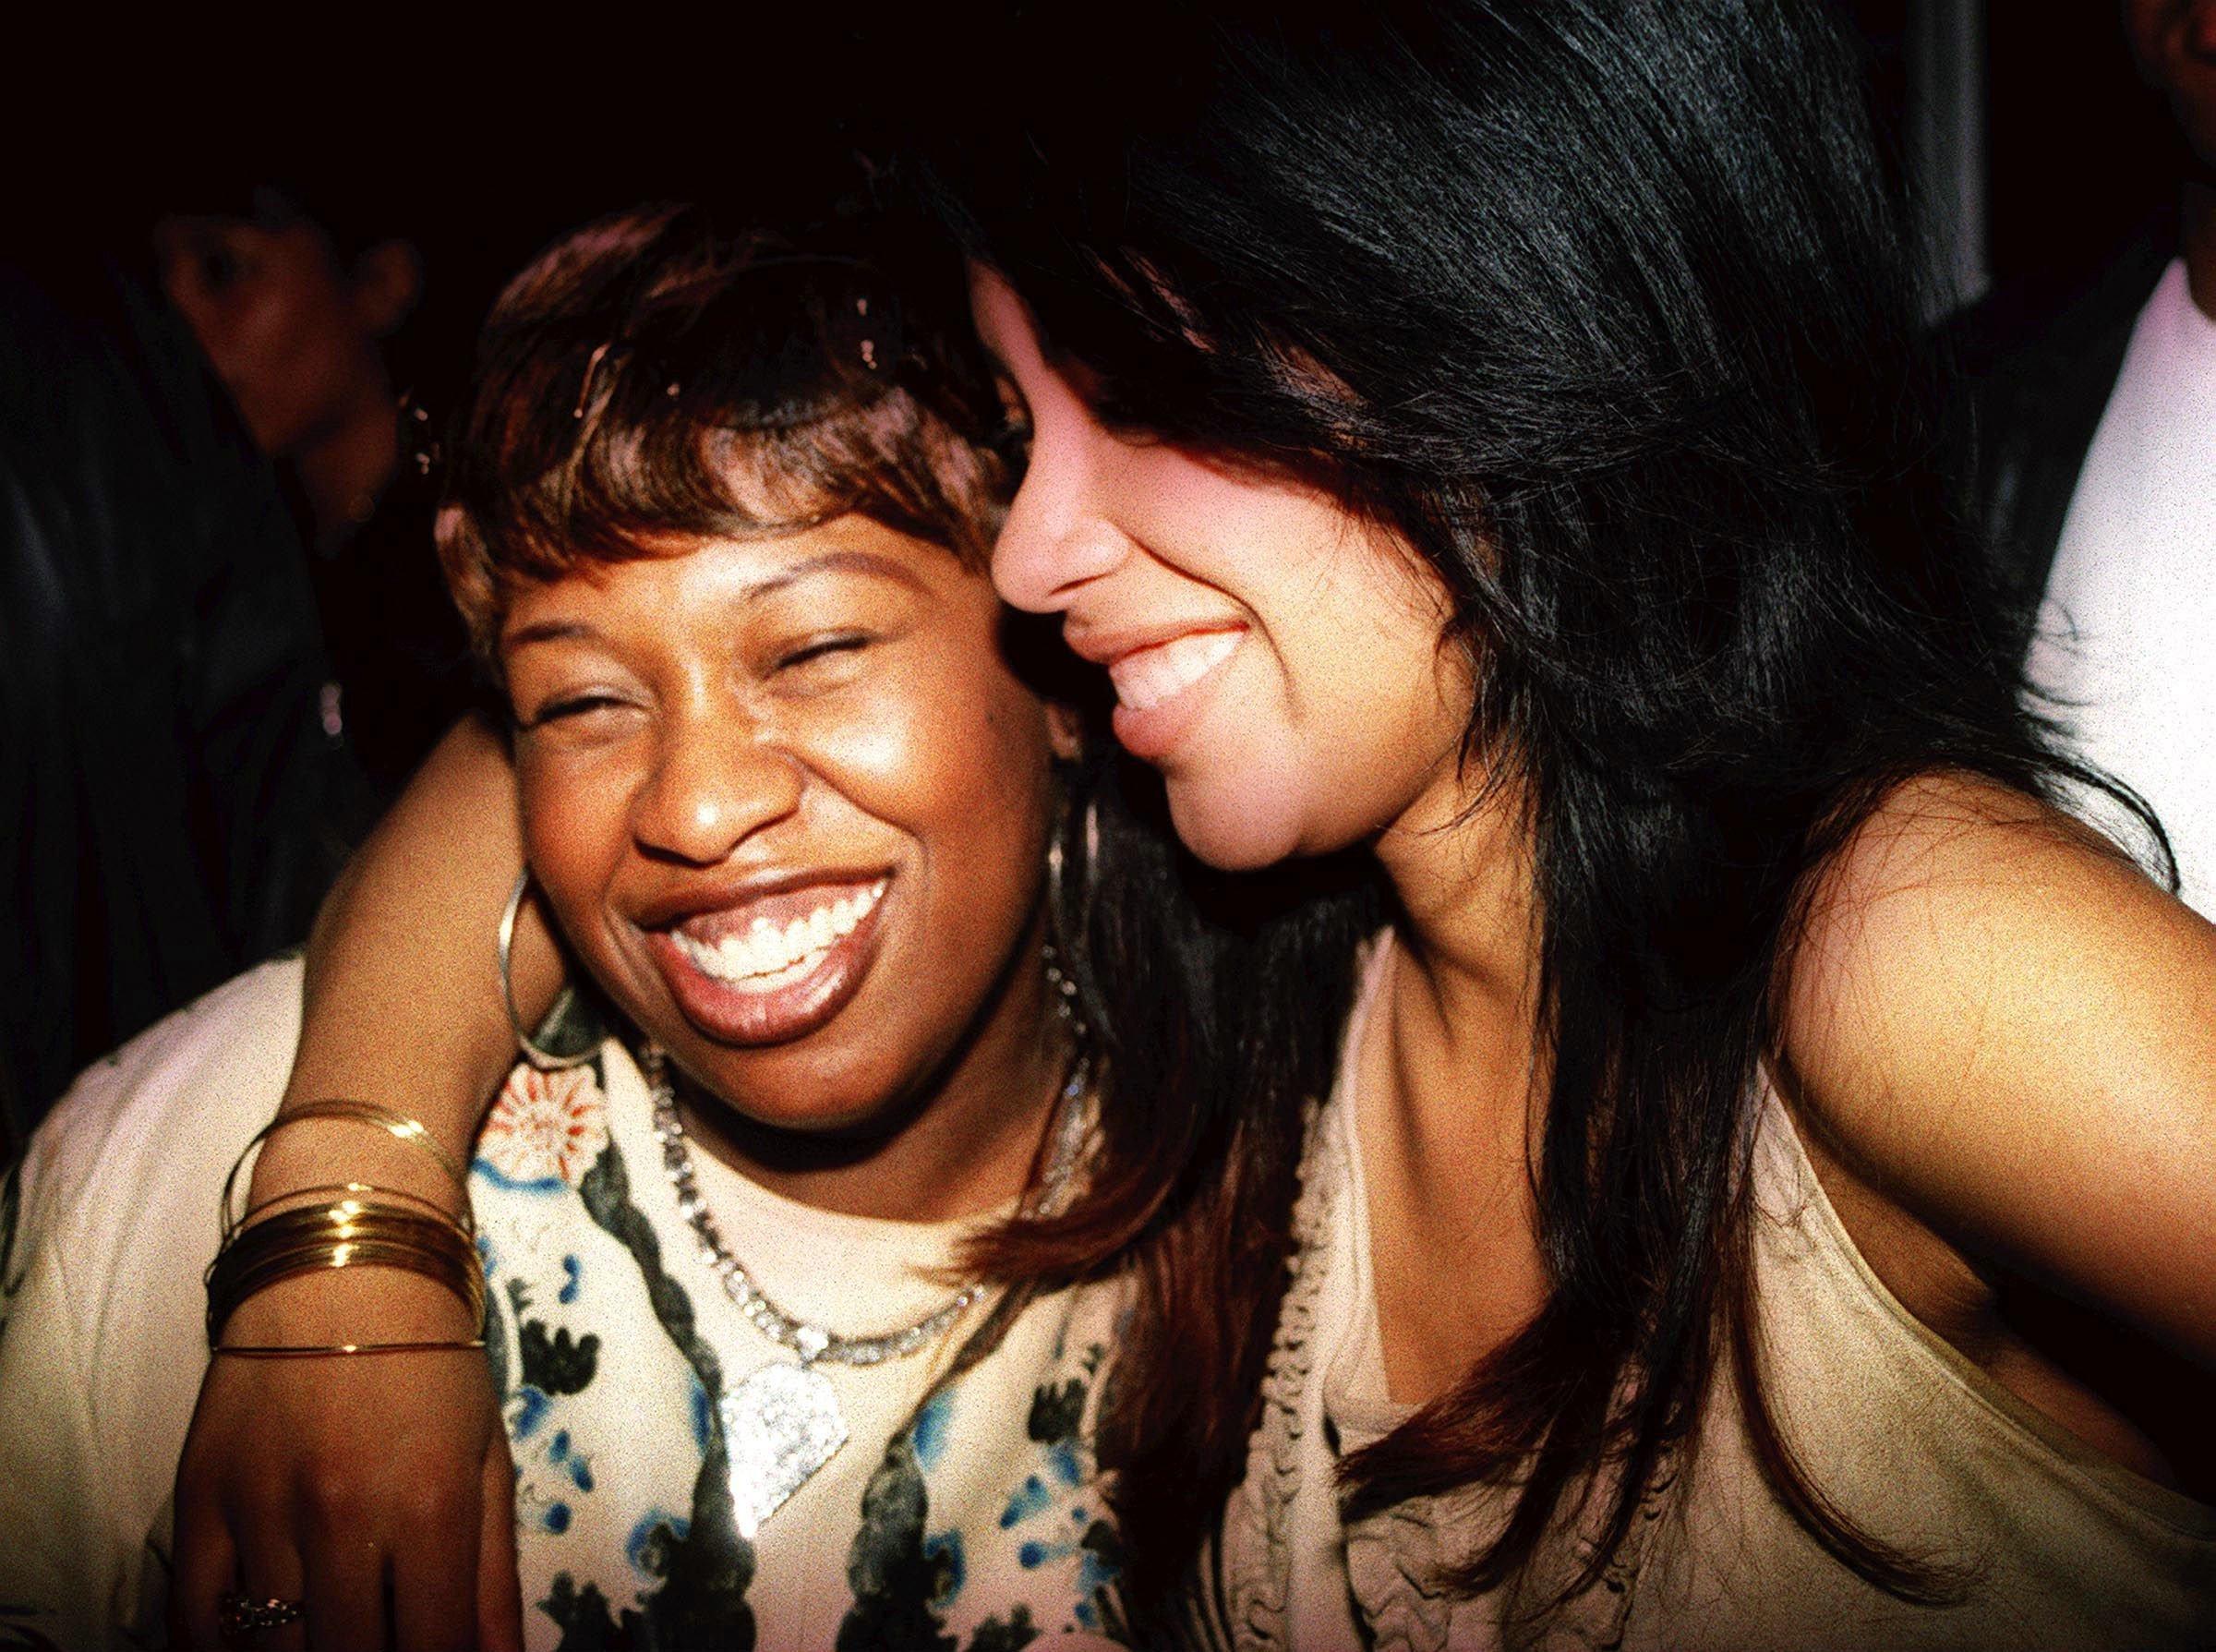 timbaland and aaliyah relationship to gladys